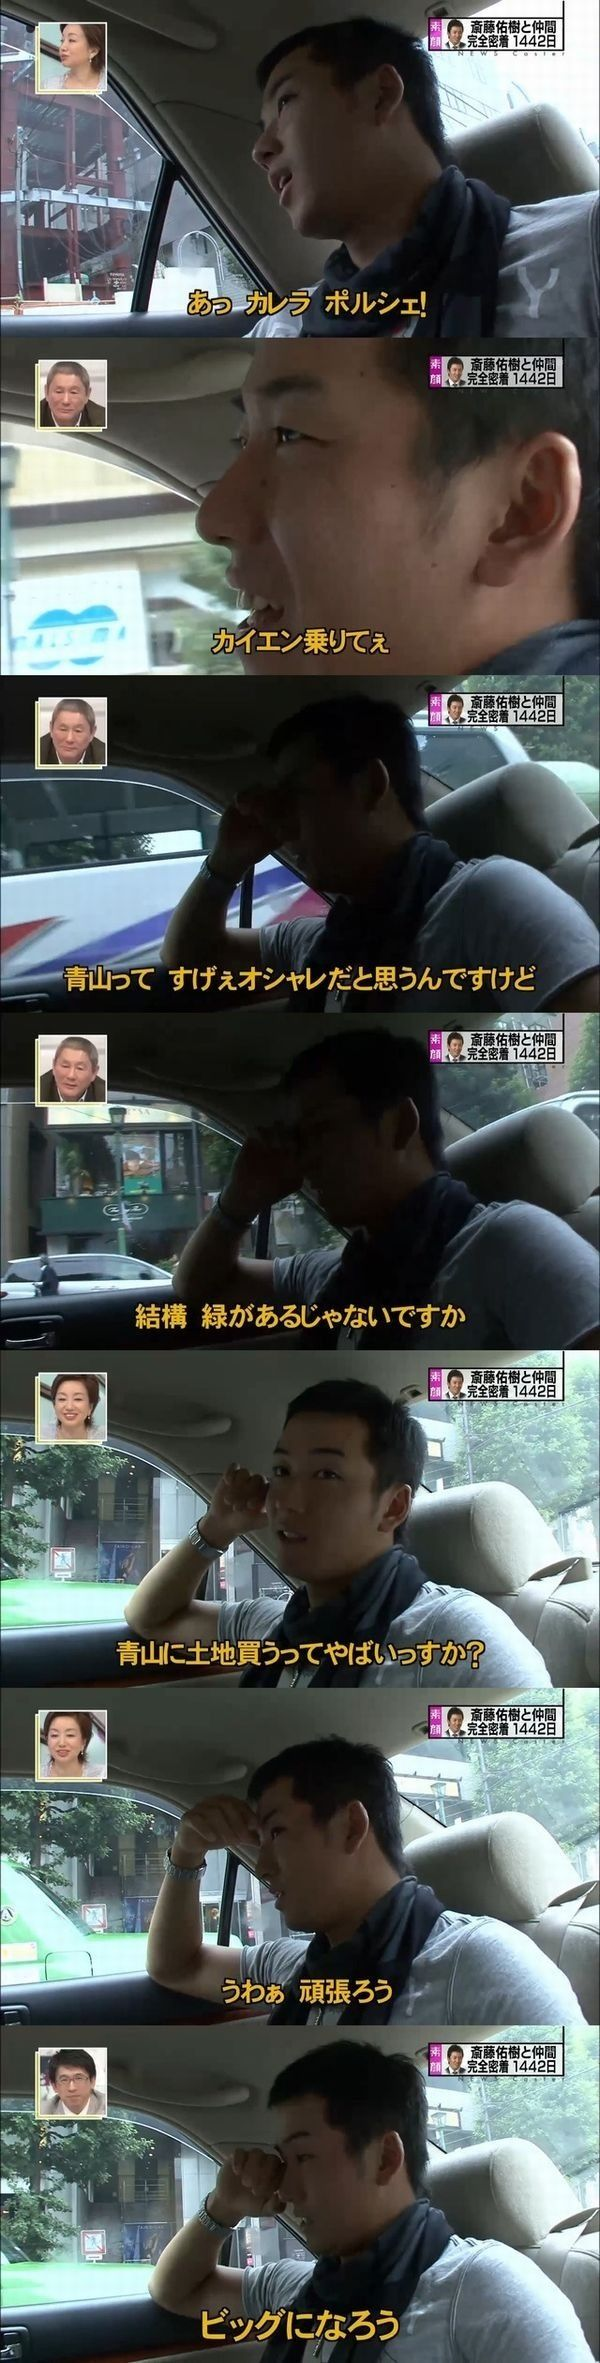 https://livedoor.blogimg.jp/saito234-affili4/imgs/0/5/059ad9cb.jpg